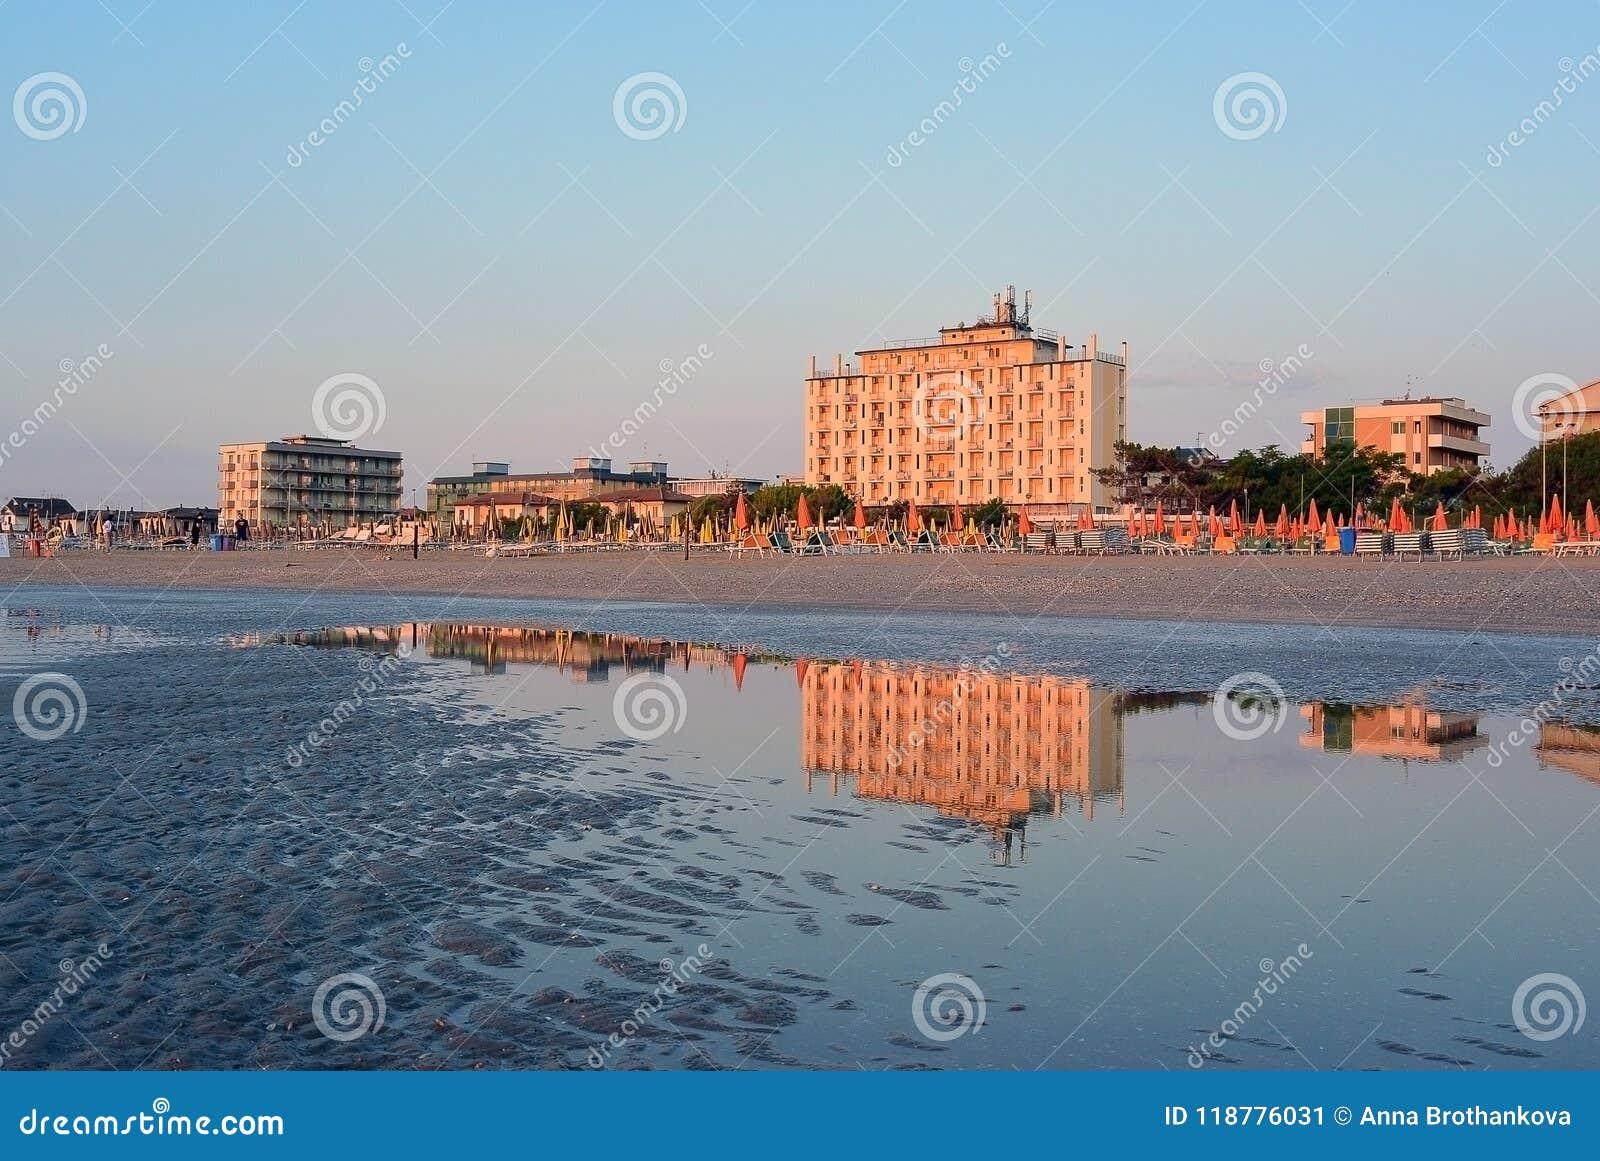 Overzeese kust en mening over Adler-hotel in Lido Di Classe, Italië